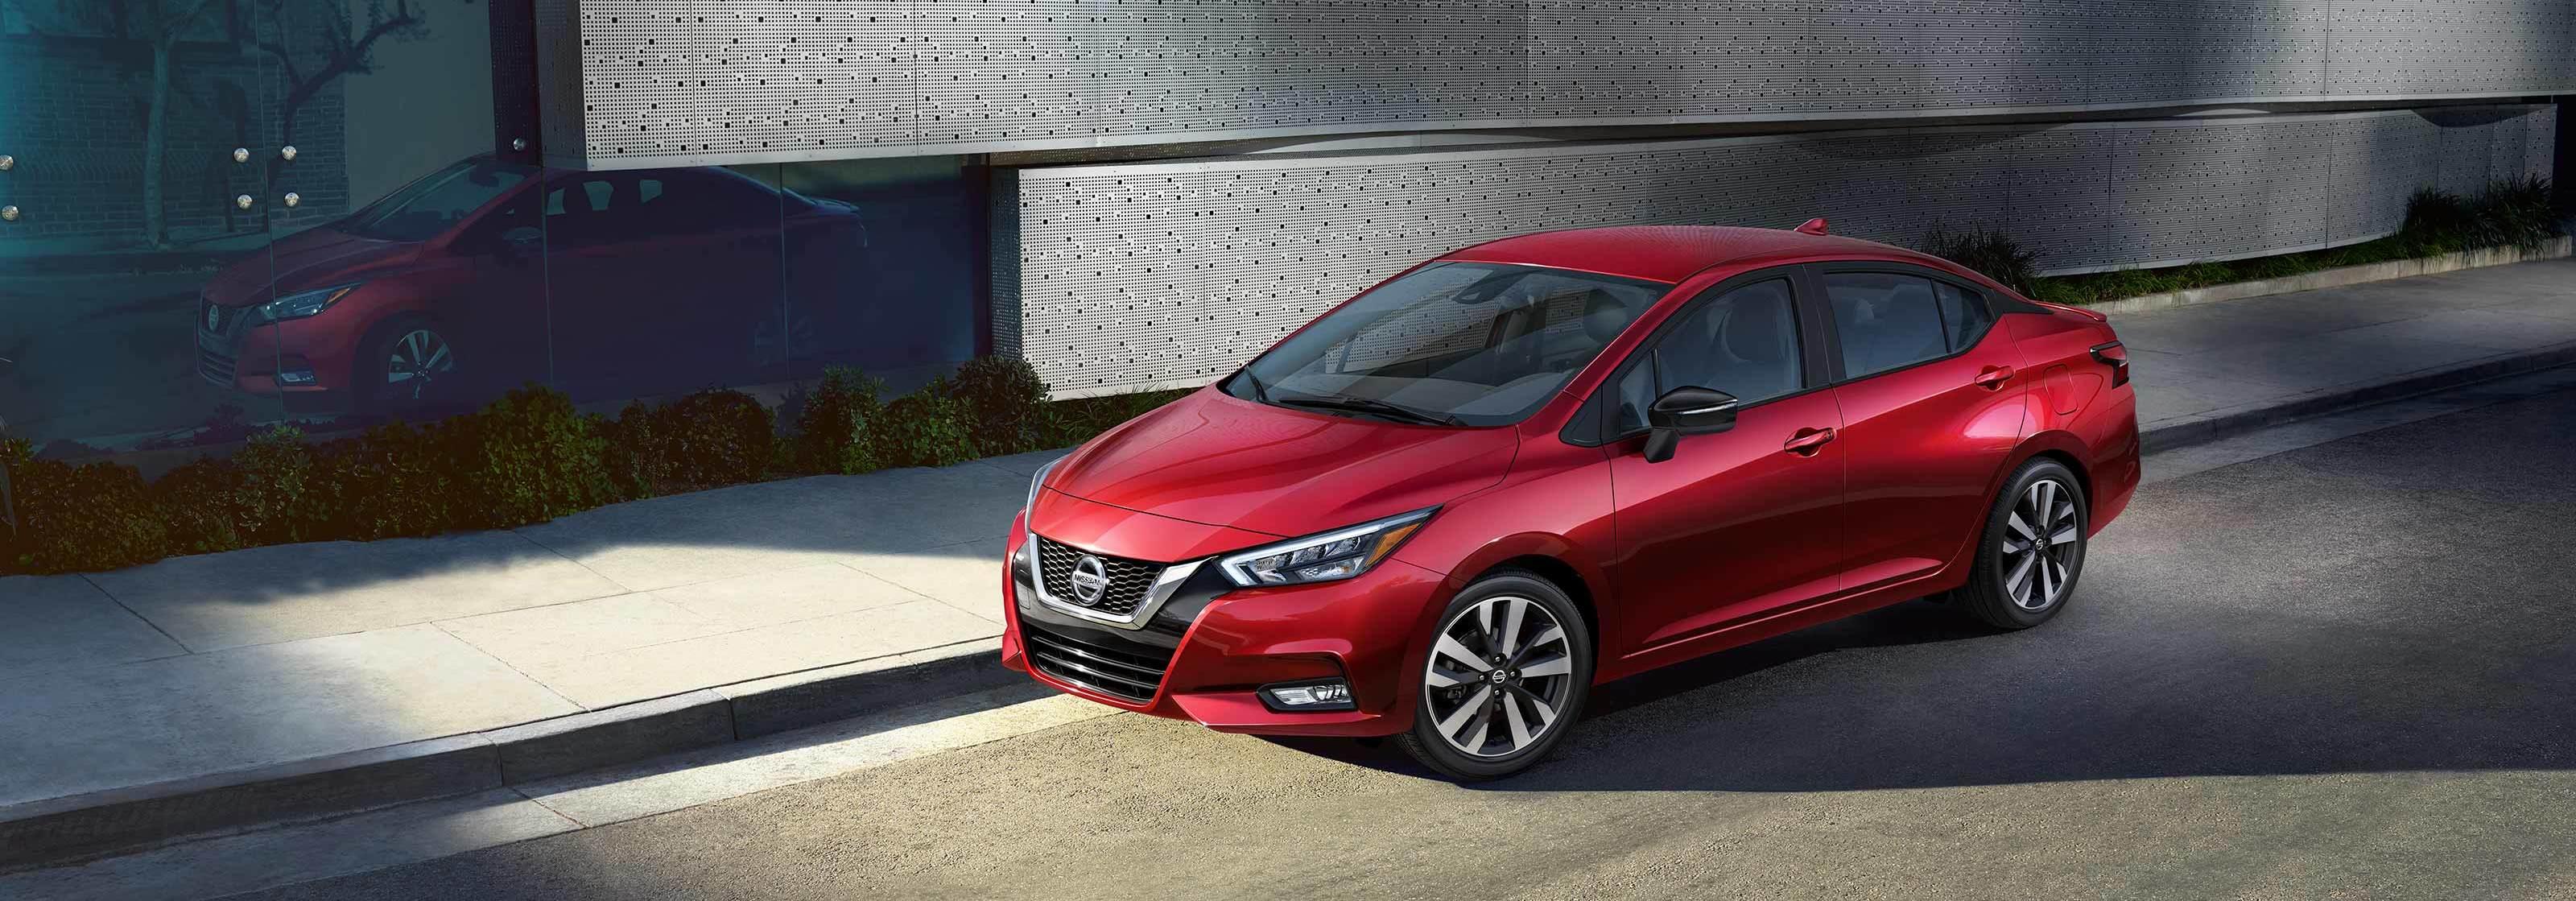 2020 Nissan Versa for Sale near Berwyn, IL